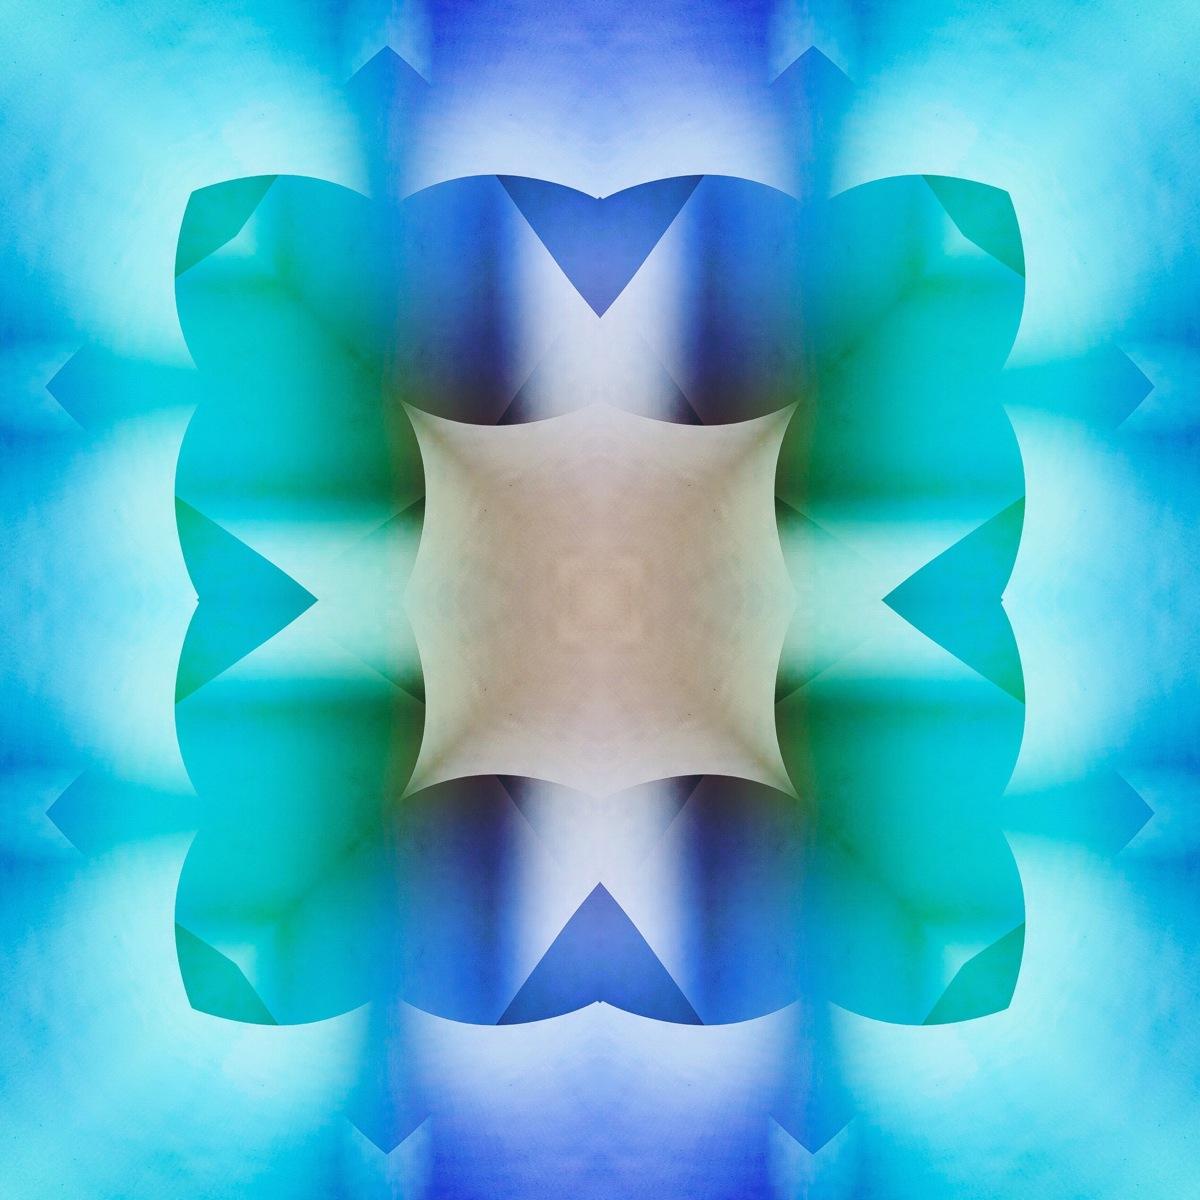 BLUE SQUARE FOLD (large view)